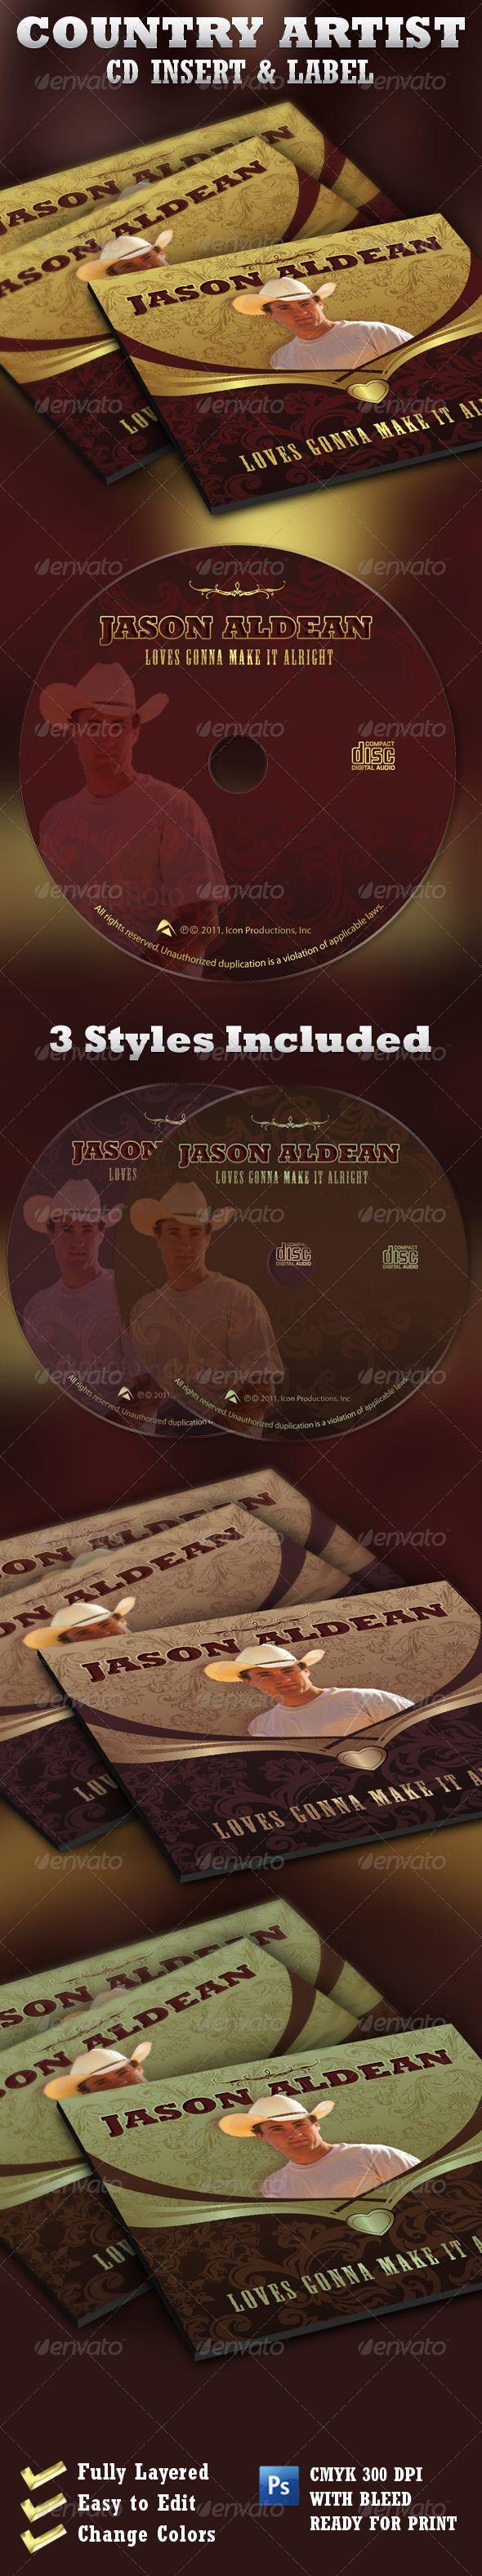 Country Artist CD Label Insert Template - CD & DVD Artwork Print Templates